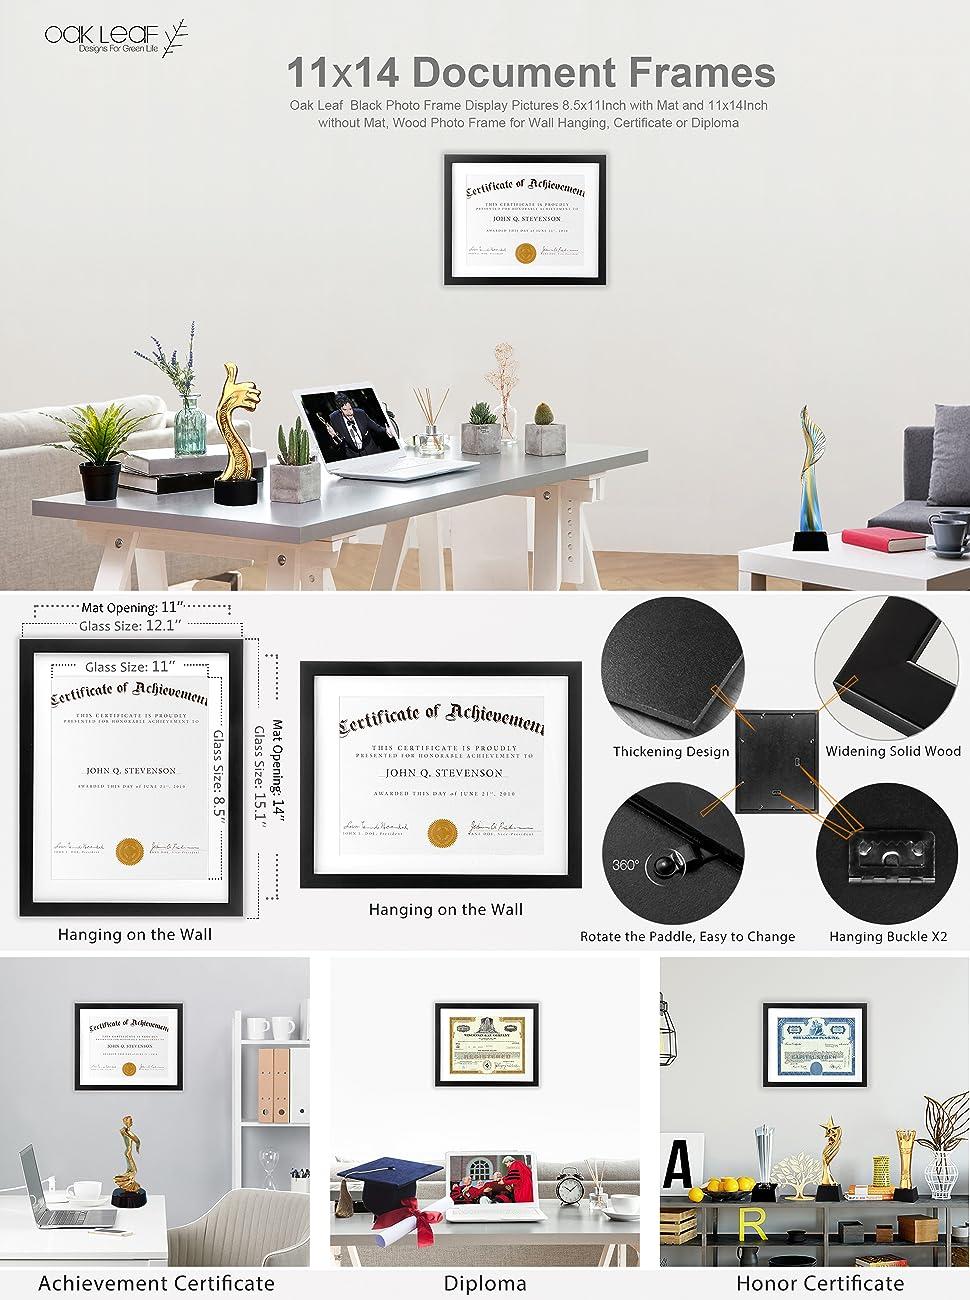 Make Memories Last A Lifetime With UnityStar Wood Document Frames